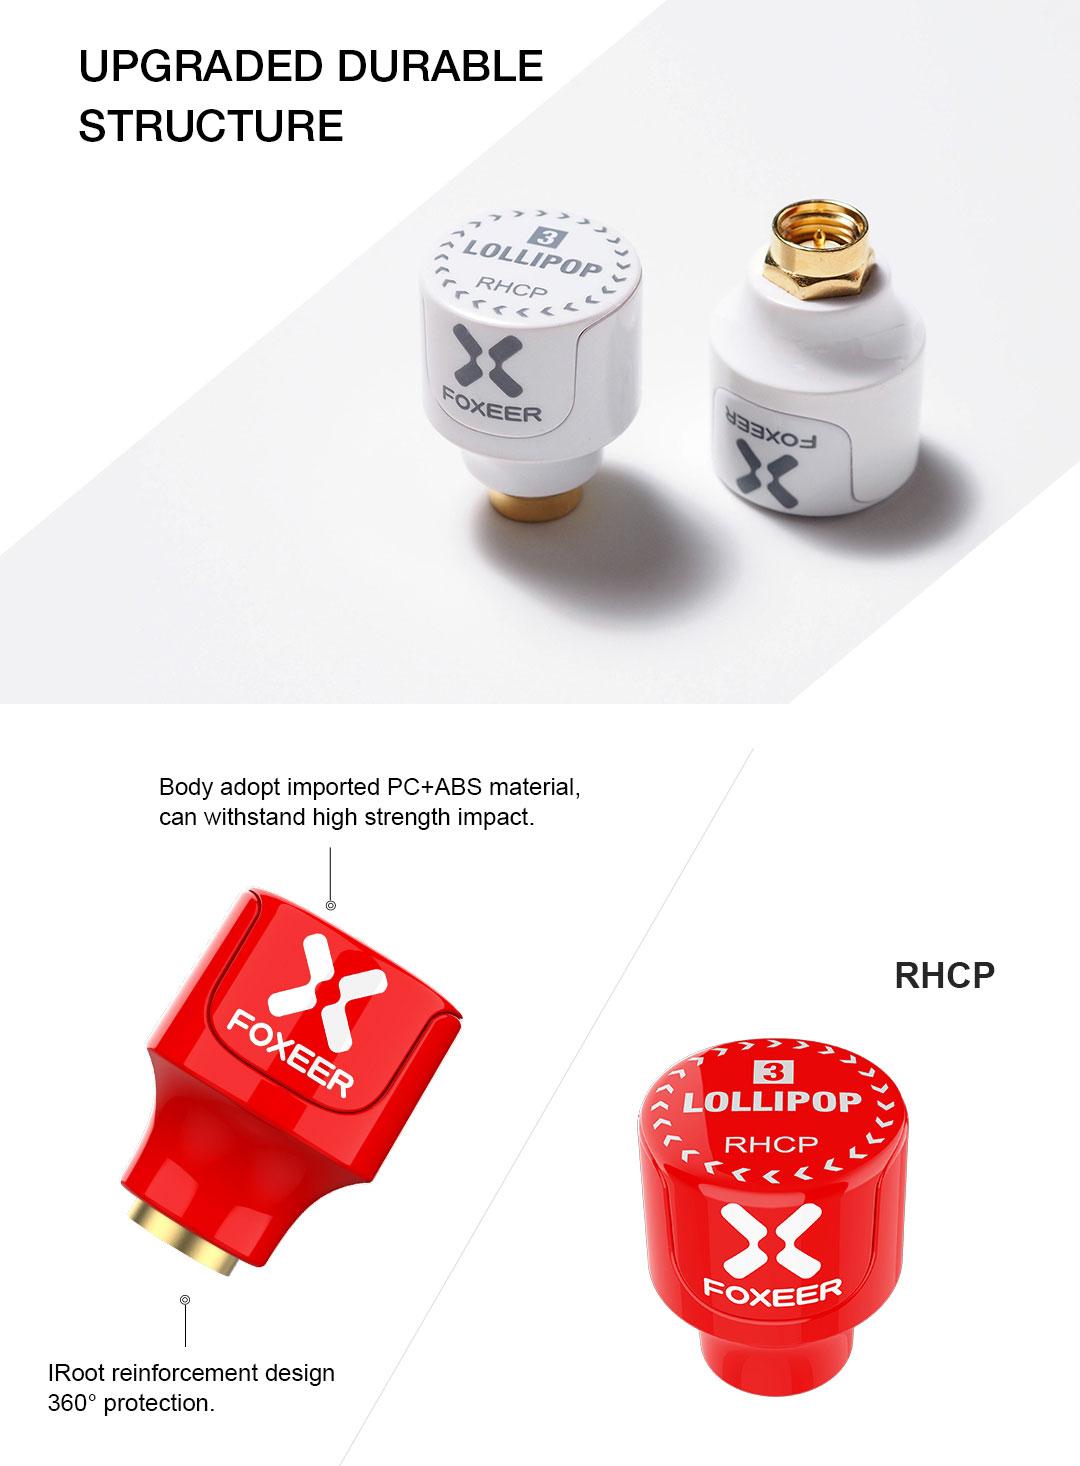 foxeer-lollipop-3-stuby-fpv-antenna_5.jpg